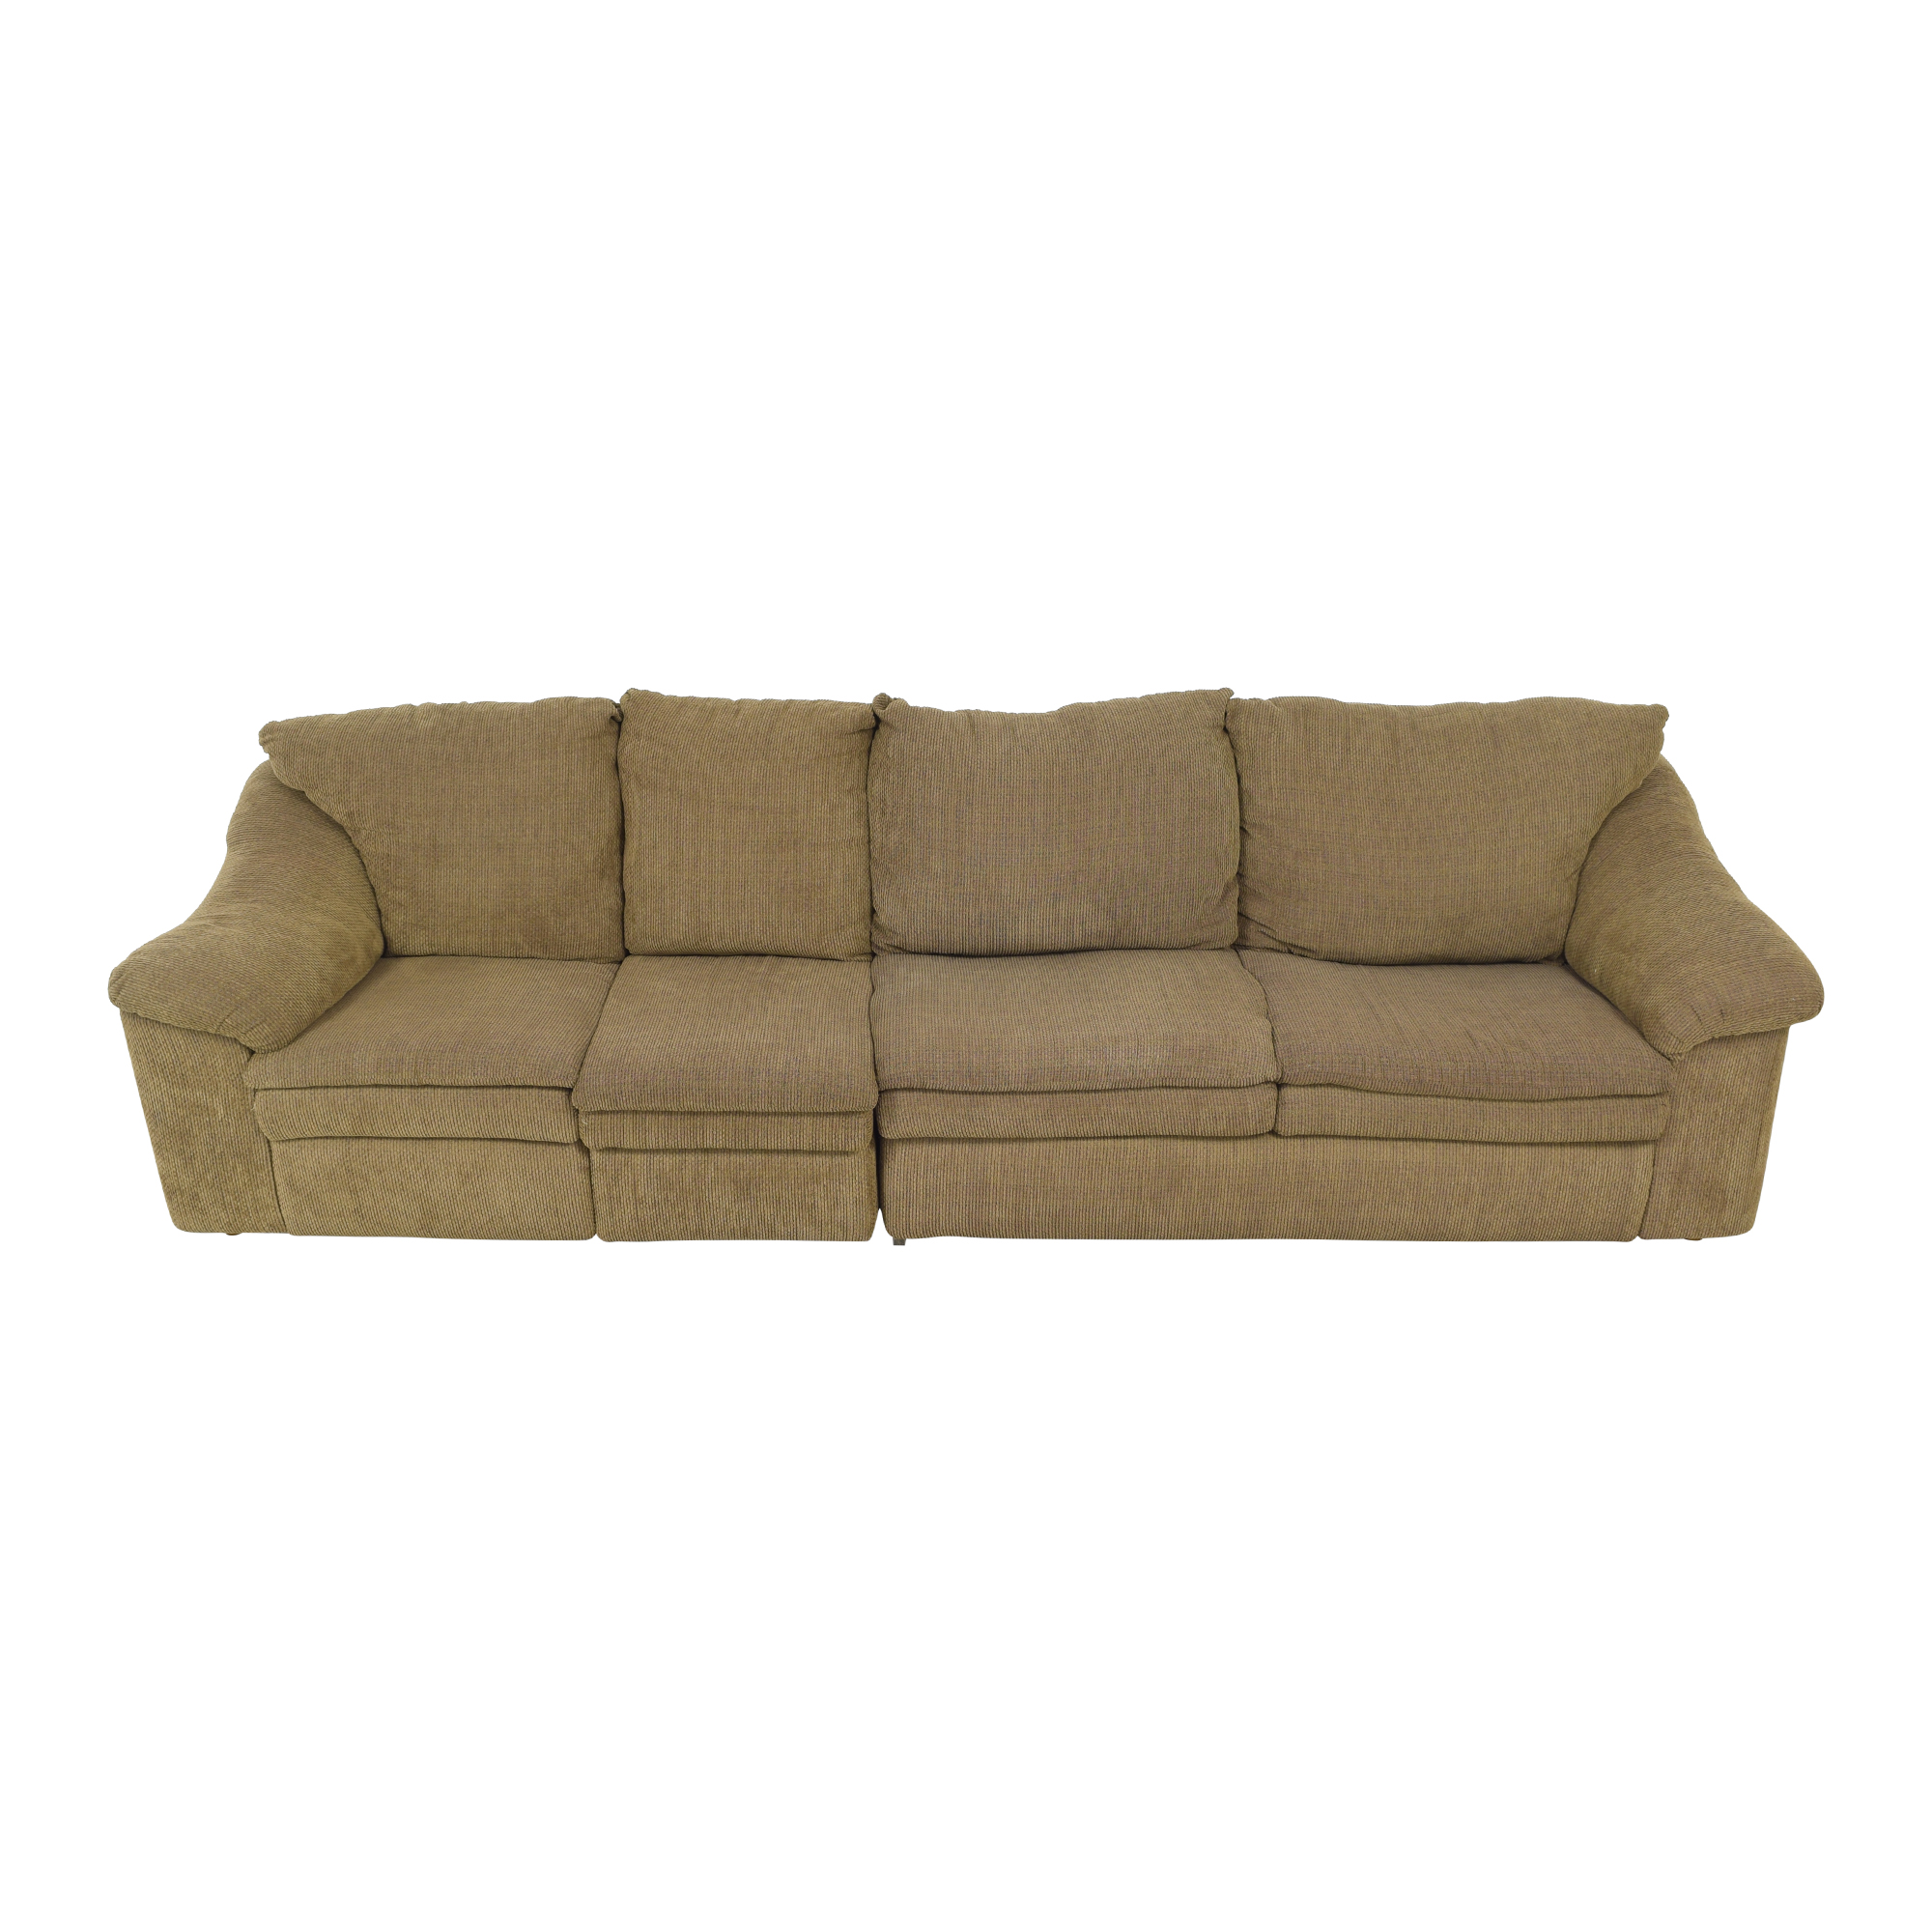 buy Raymour & Flanigan Raymour & Flanigan Sleeper Sofa with Ottoman online